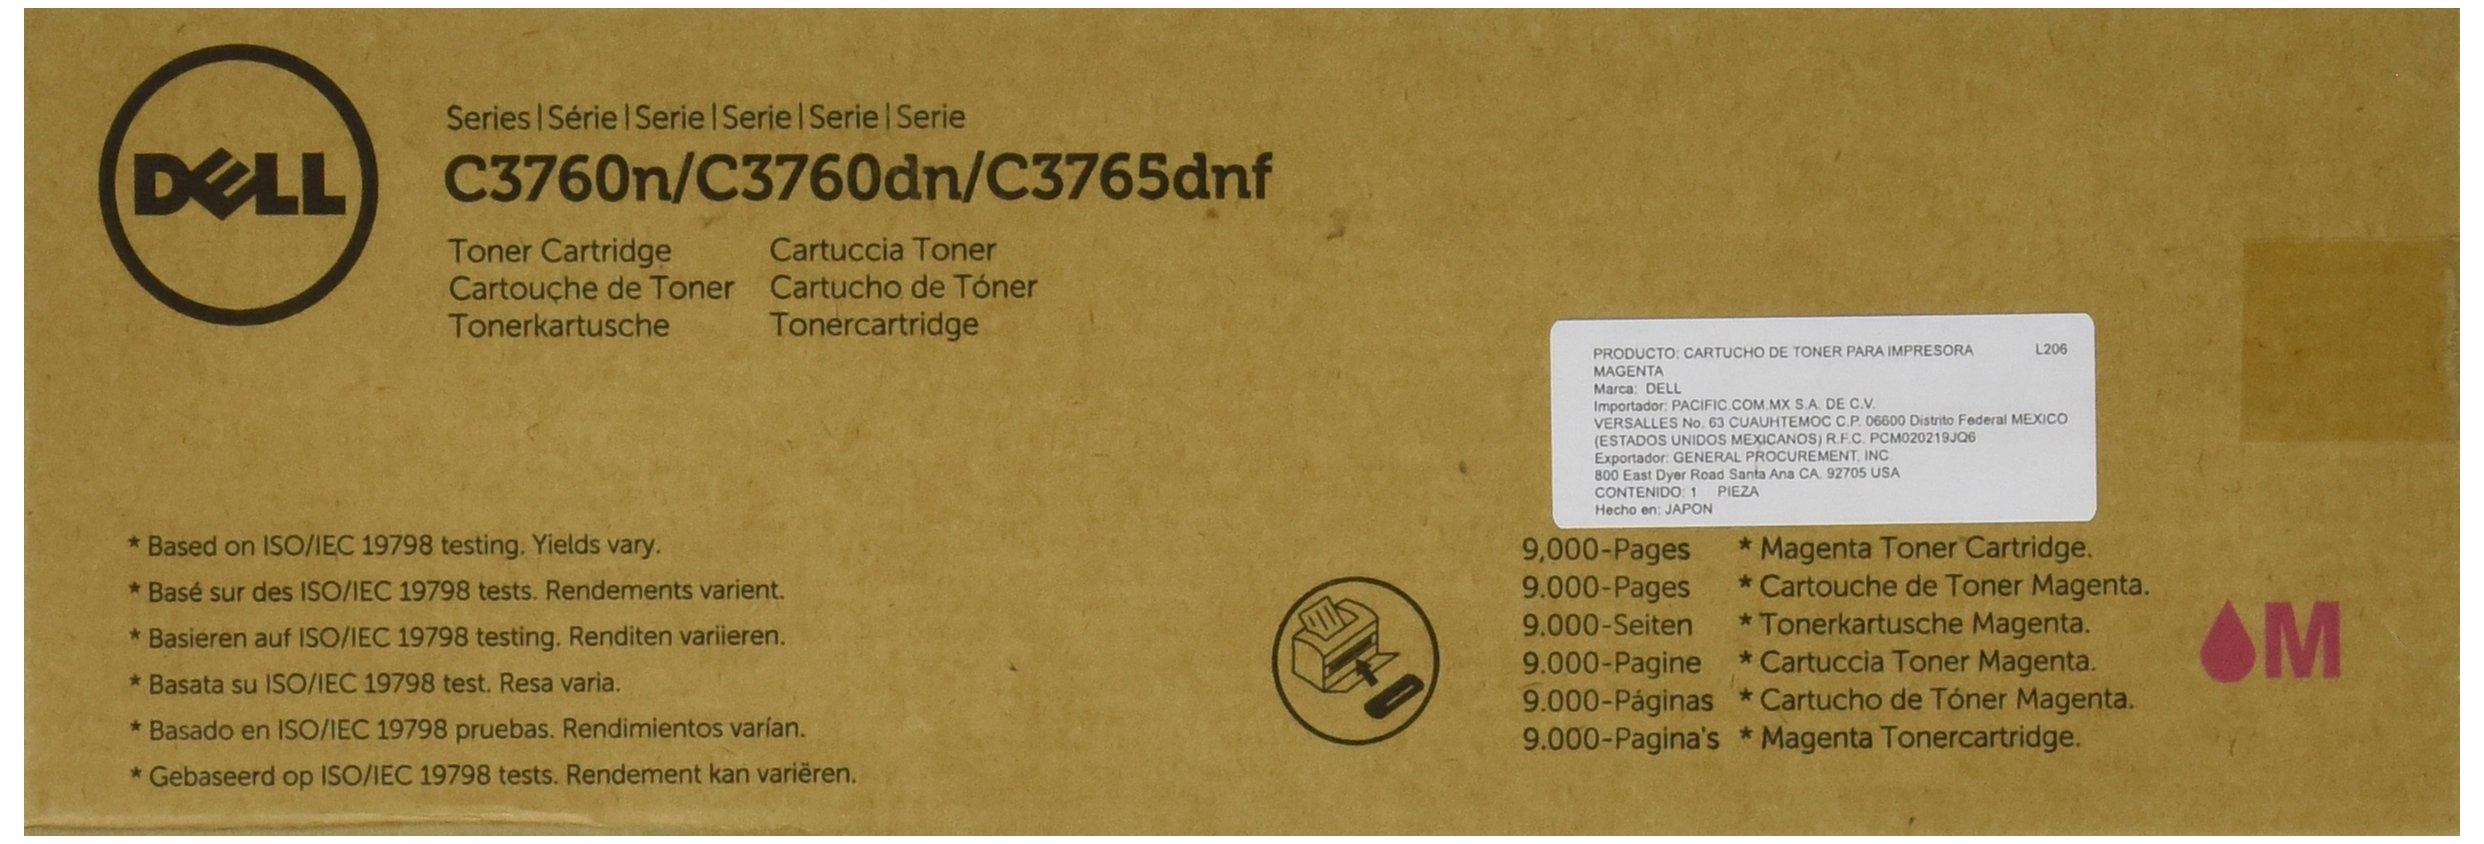 Toner Original DELL XKGFP C3760N/C3760DN/C3765DNF Color Laser